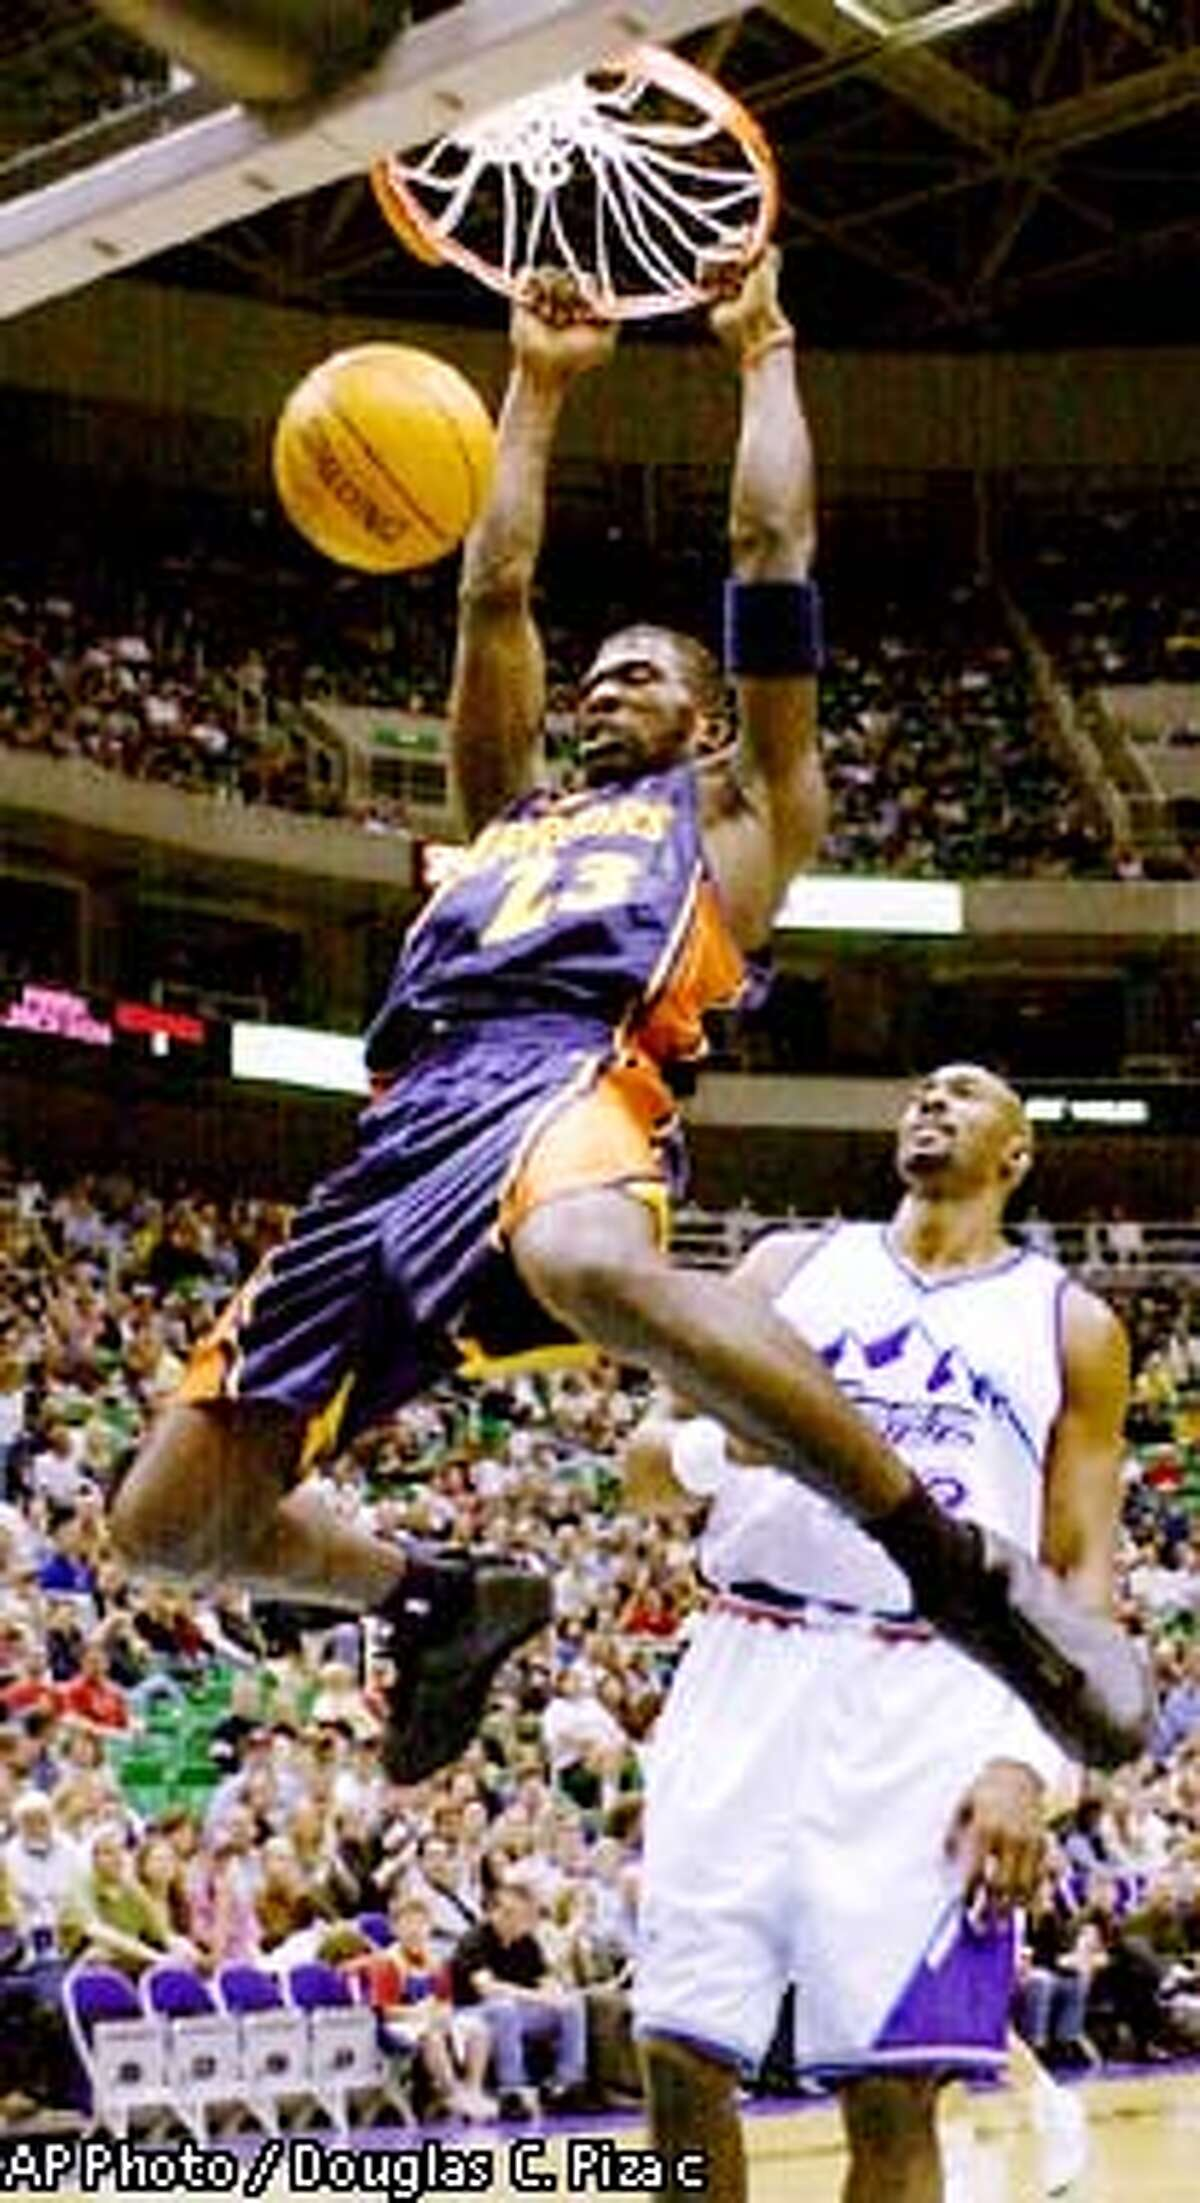 Golden State Warriors guard Jason Richardson (23) dunks on the fast break basket against Utah Jazz forward Karl Malone during the first quarter Friday, Jan. 31, 2003, in Salt Lake City. (AP Photo / Douglas C. Pizac)